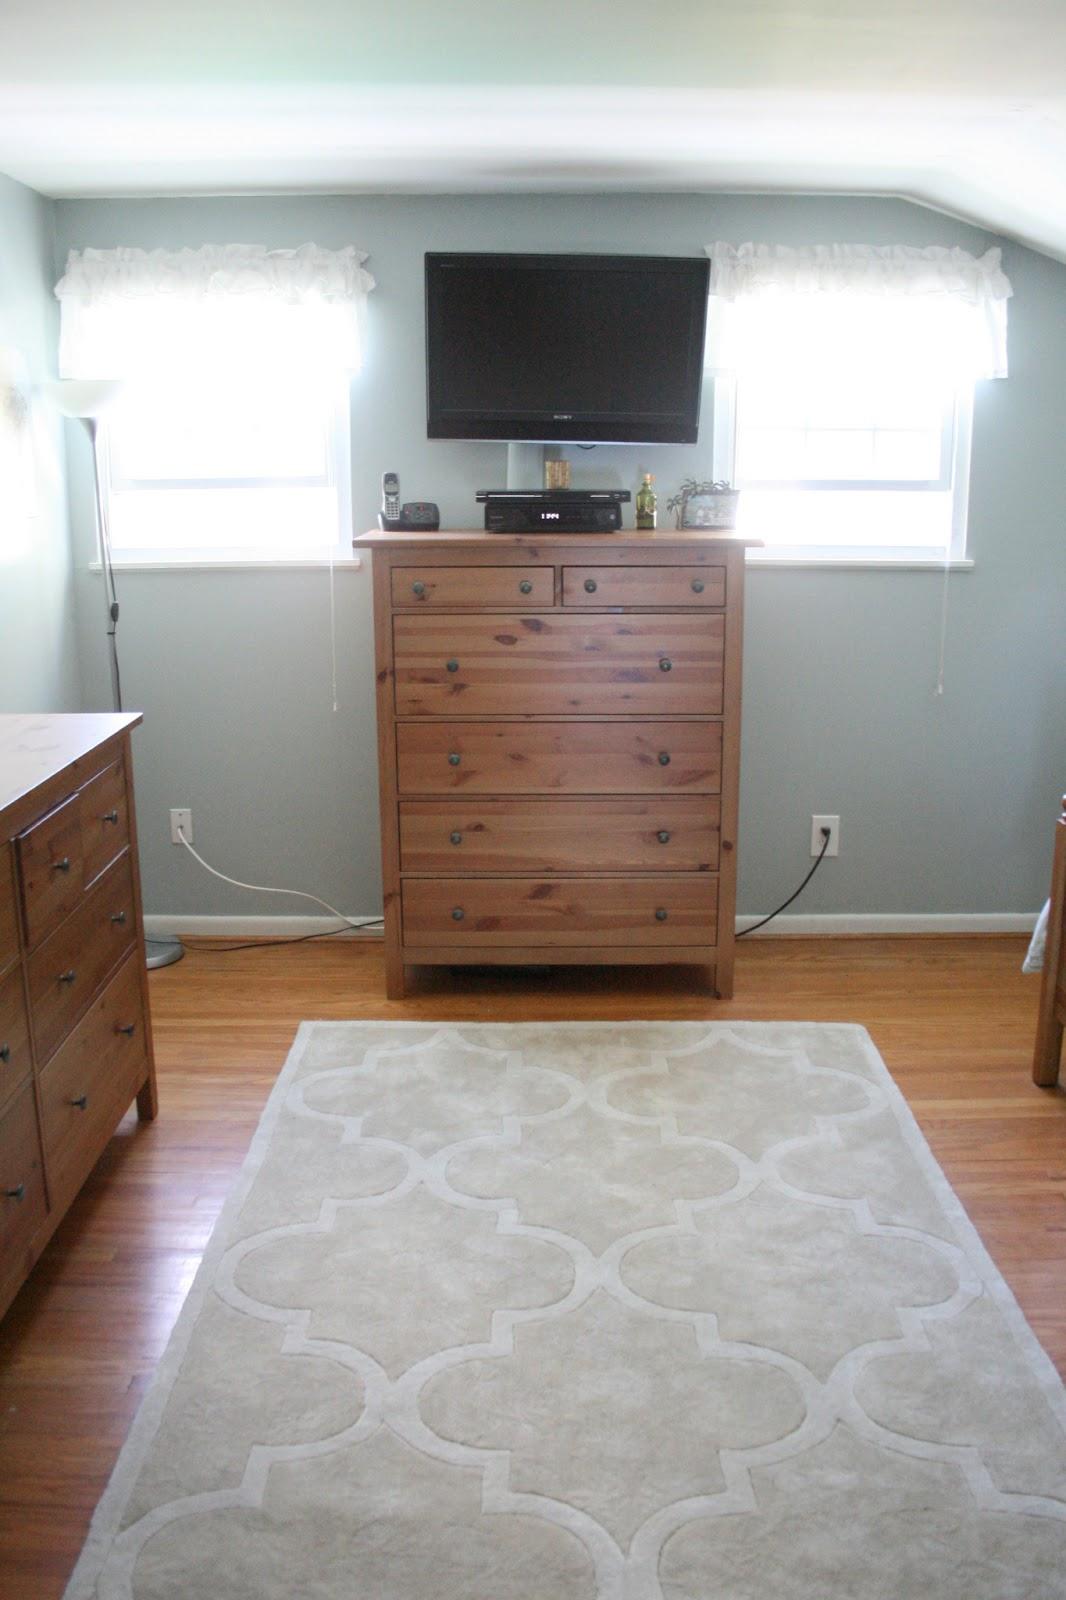 Best Throw Rugs For Hardwood Floors - Interior Decorating ...